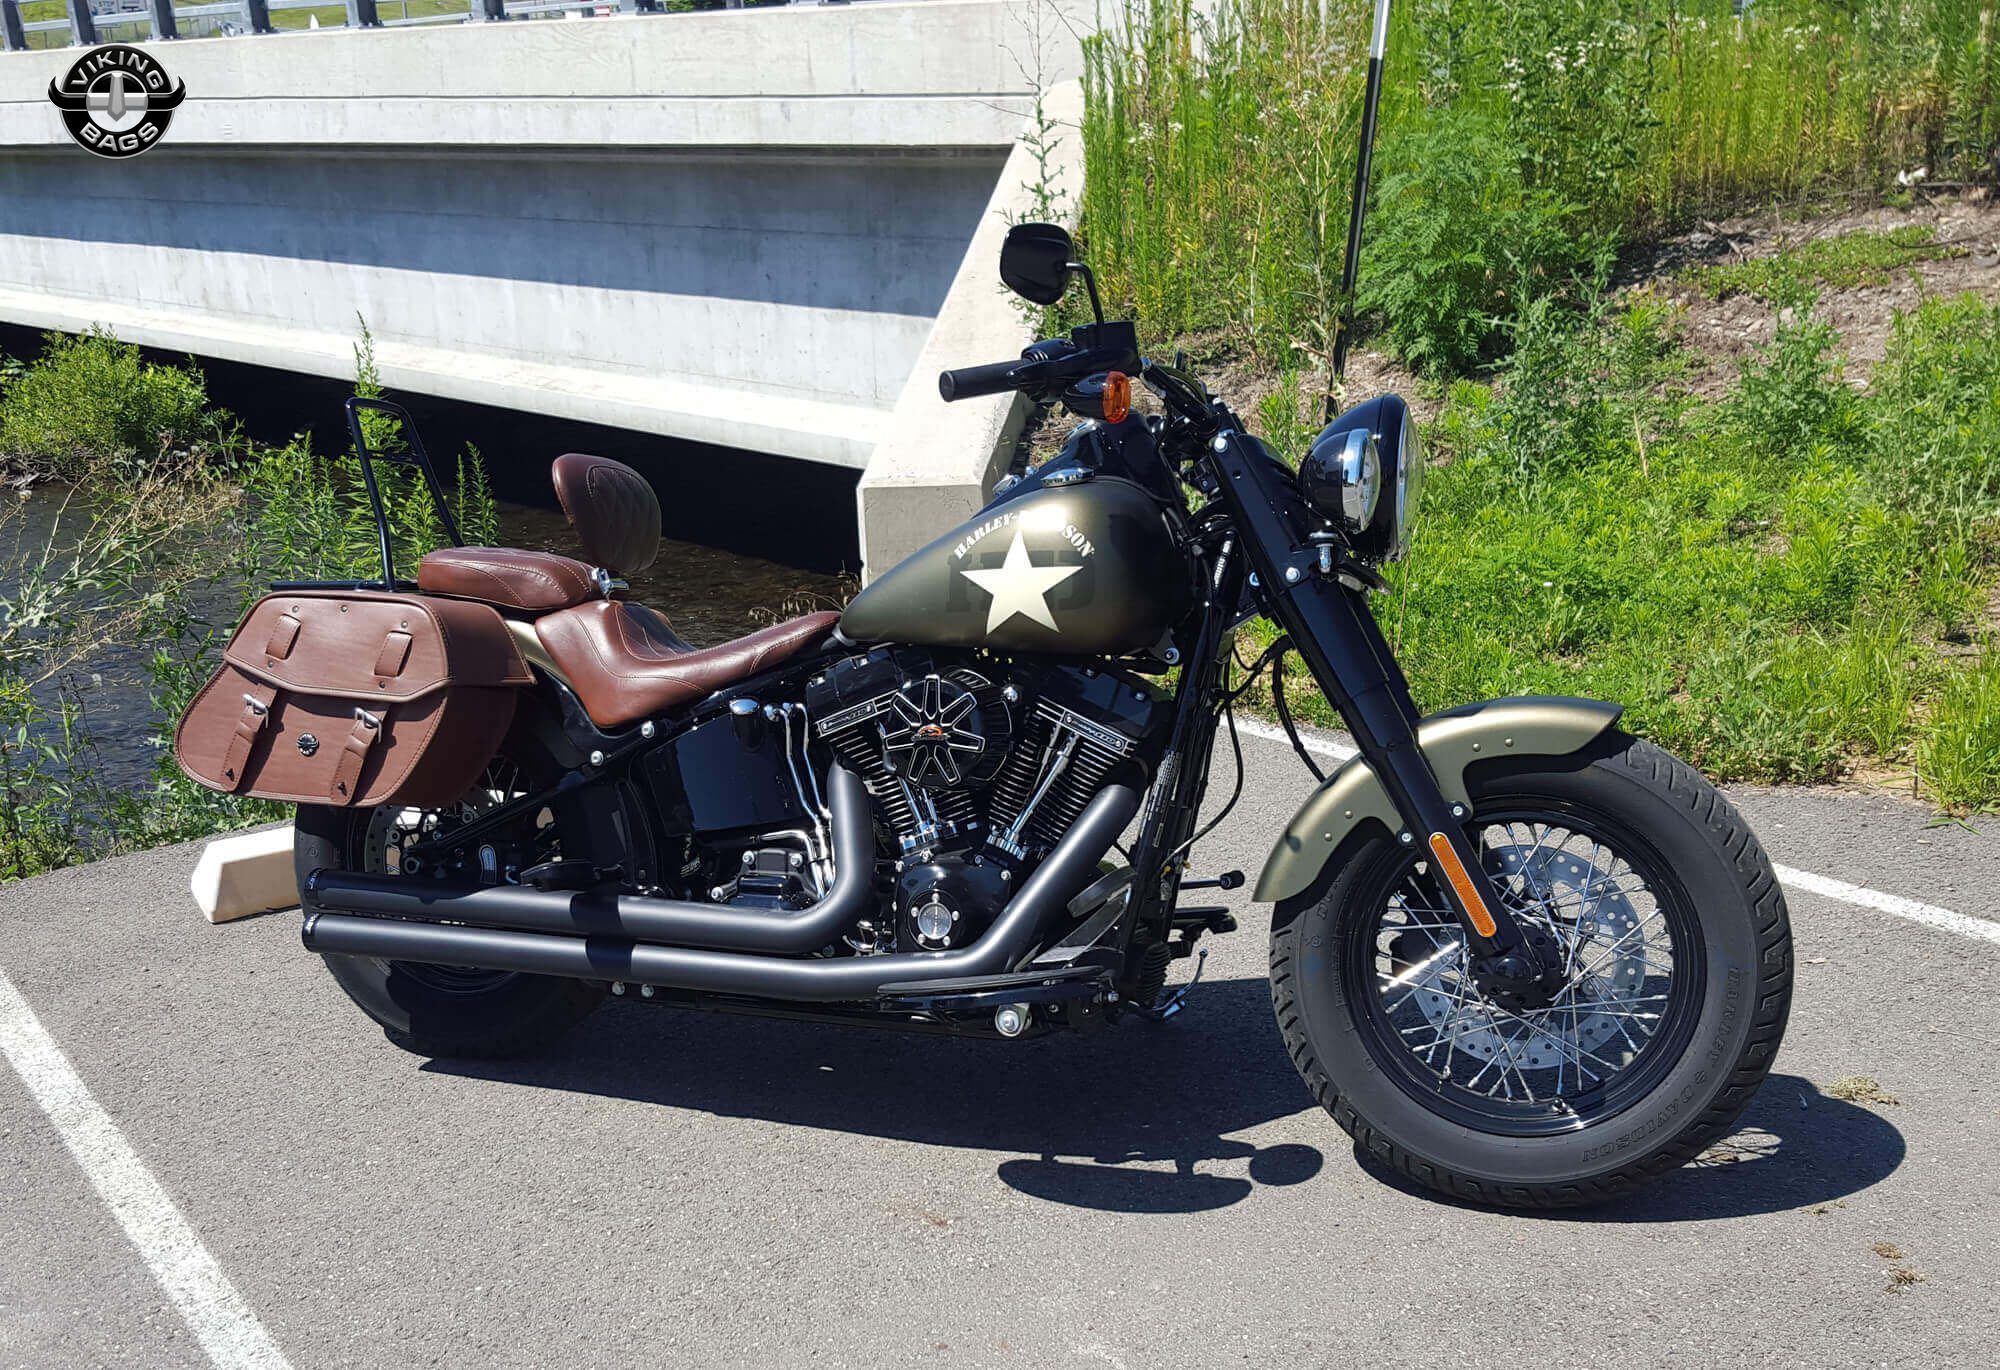 Leather Saddlebags For Harley Davidson Softail Best Model Bag 2016